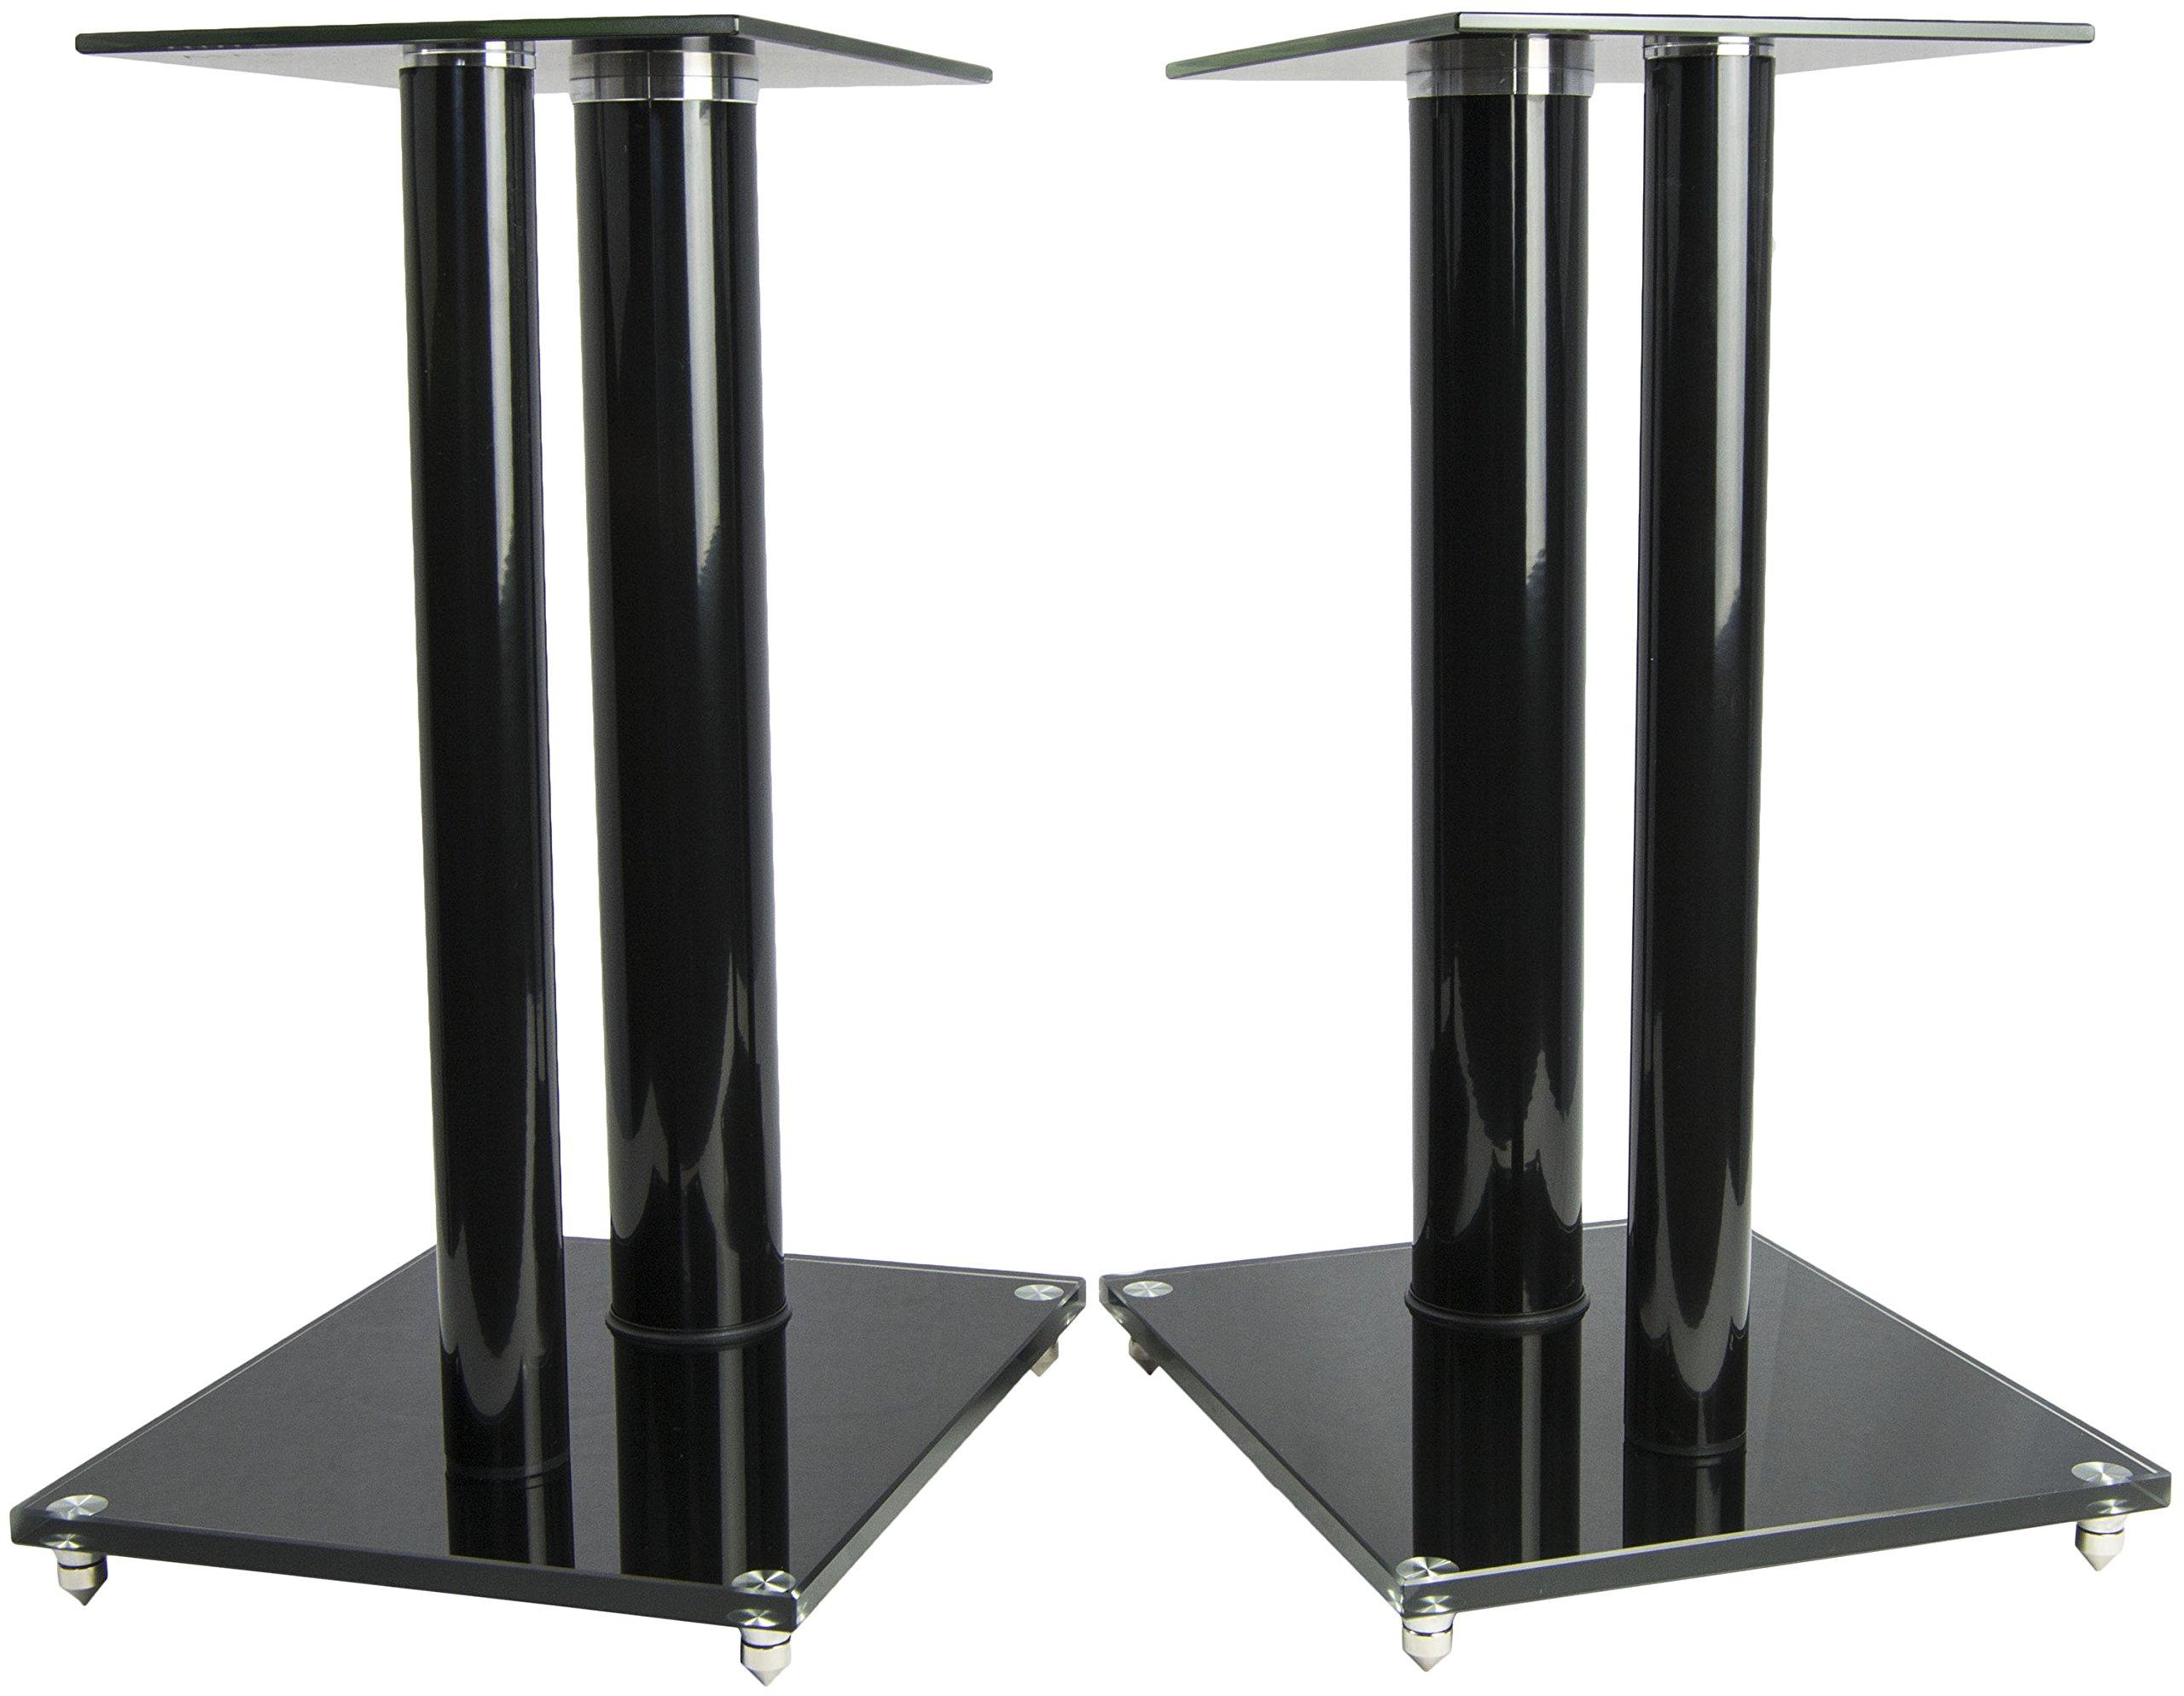 VIVO Premium Universal Floor Speaker Stands Dual Pillar for Surround Sound & Book Shelf Speakers (STAND-SP01B)